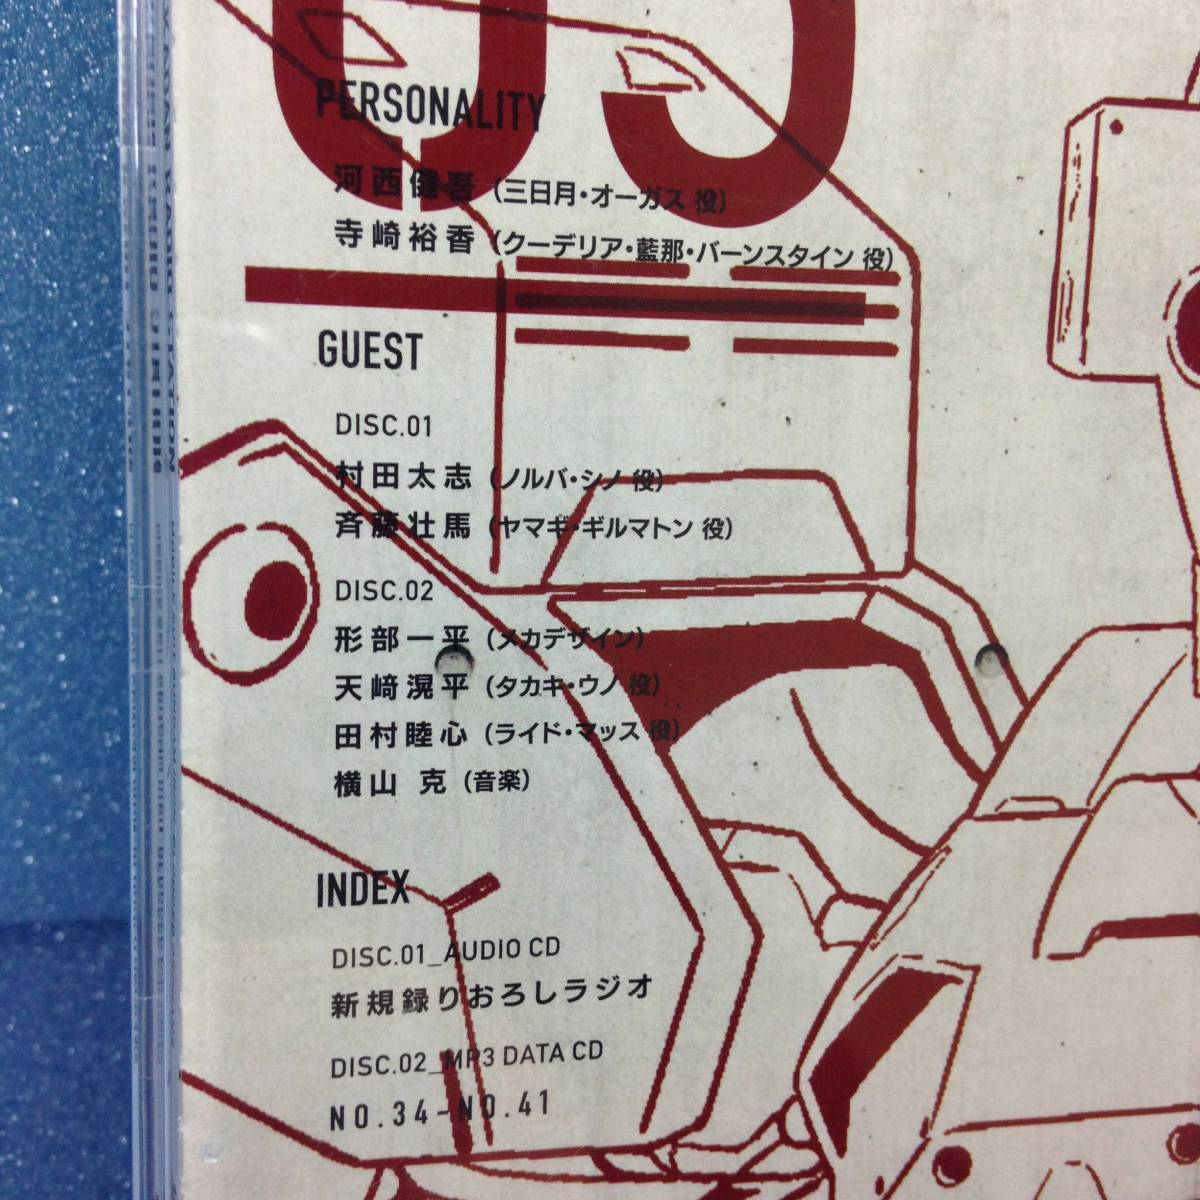 ◆(CD2枚組) TEKKADAN RADIO STATION 05 ラジオCD 鉄華団放送局 Vol.5 機動戦士ガンダム 鉄血のオルフェンズ_画像2